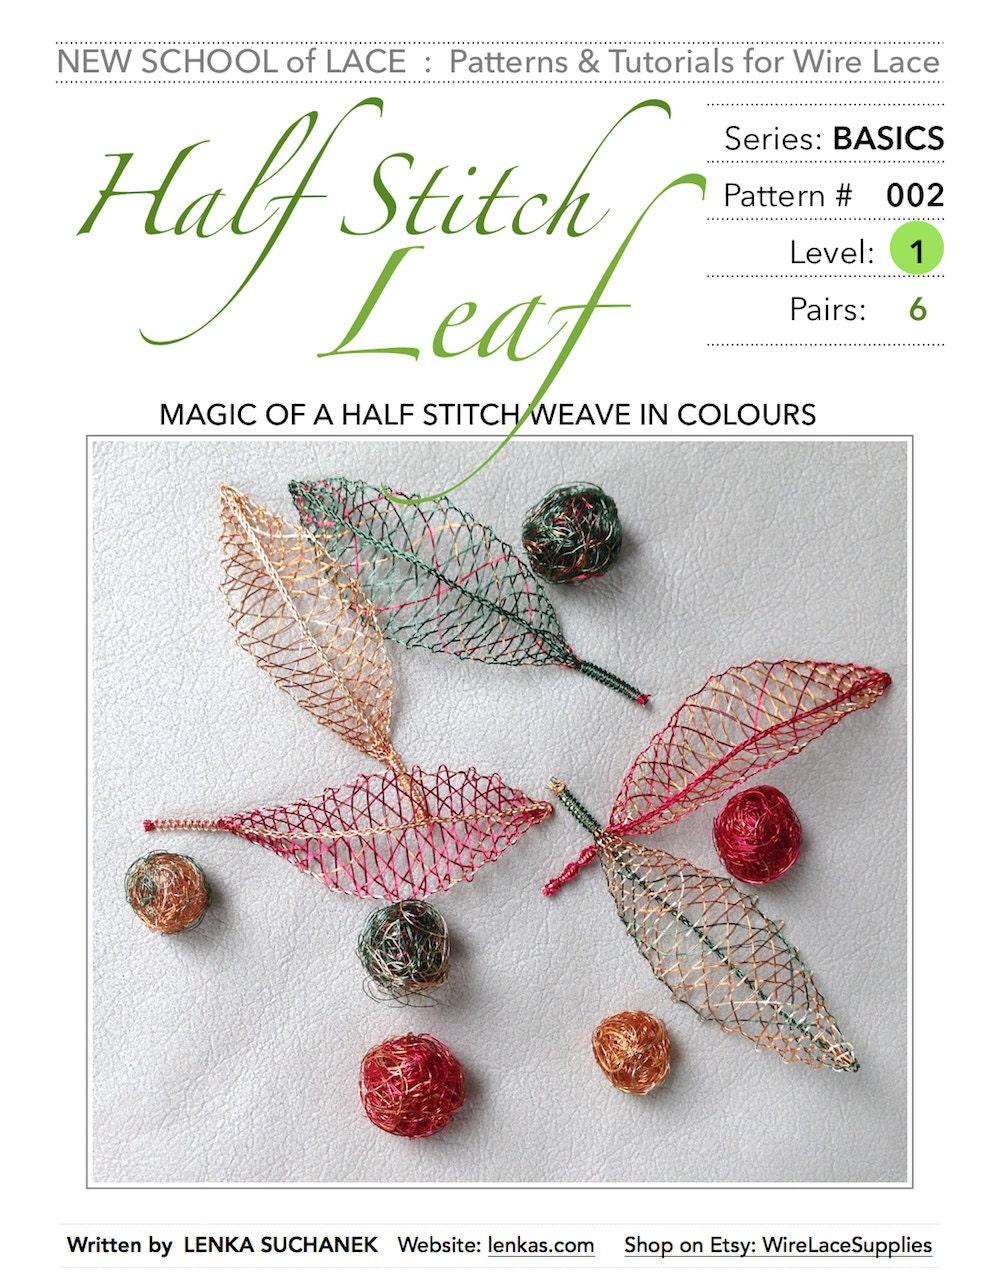 Half Stitch Leaf Pattern & Tutorial for Wire Lace :